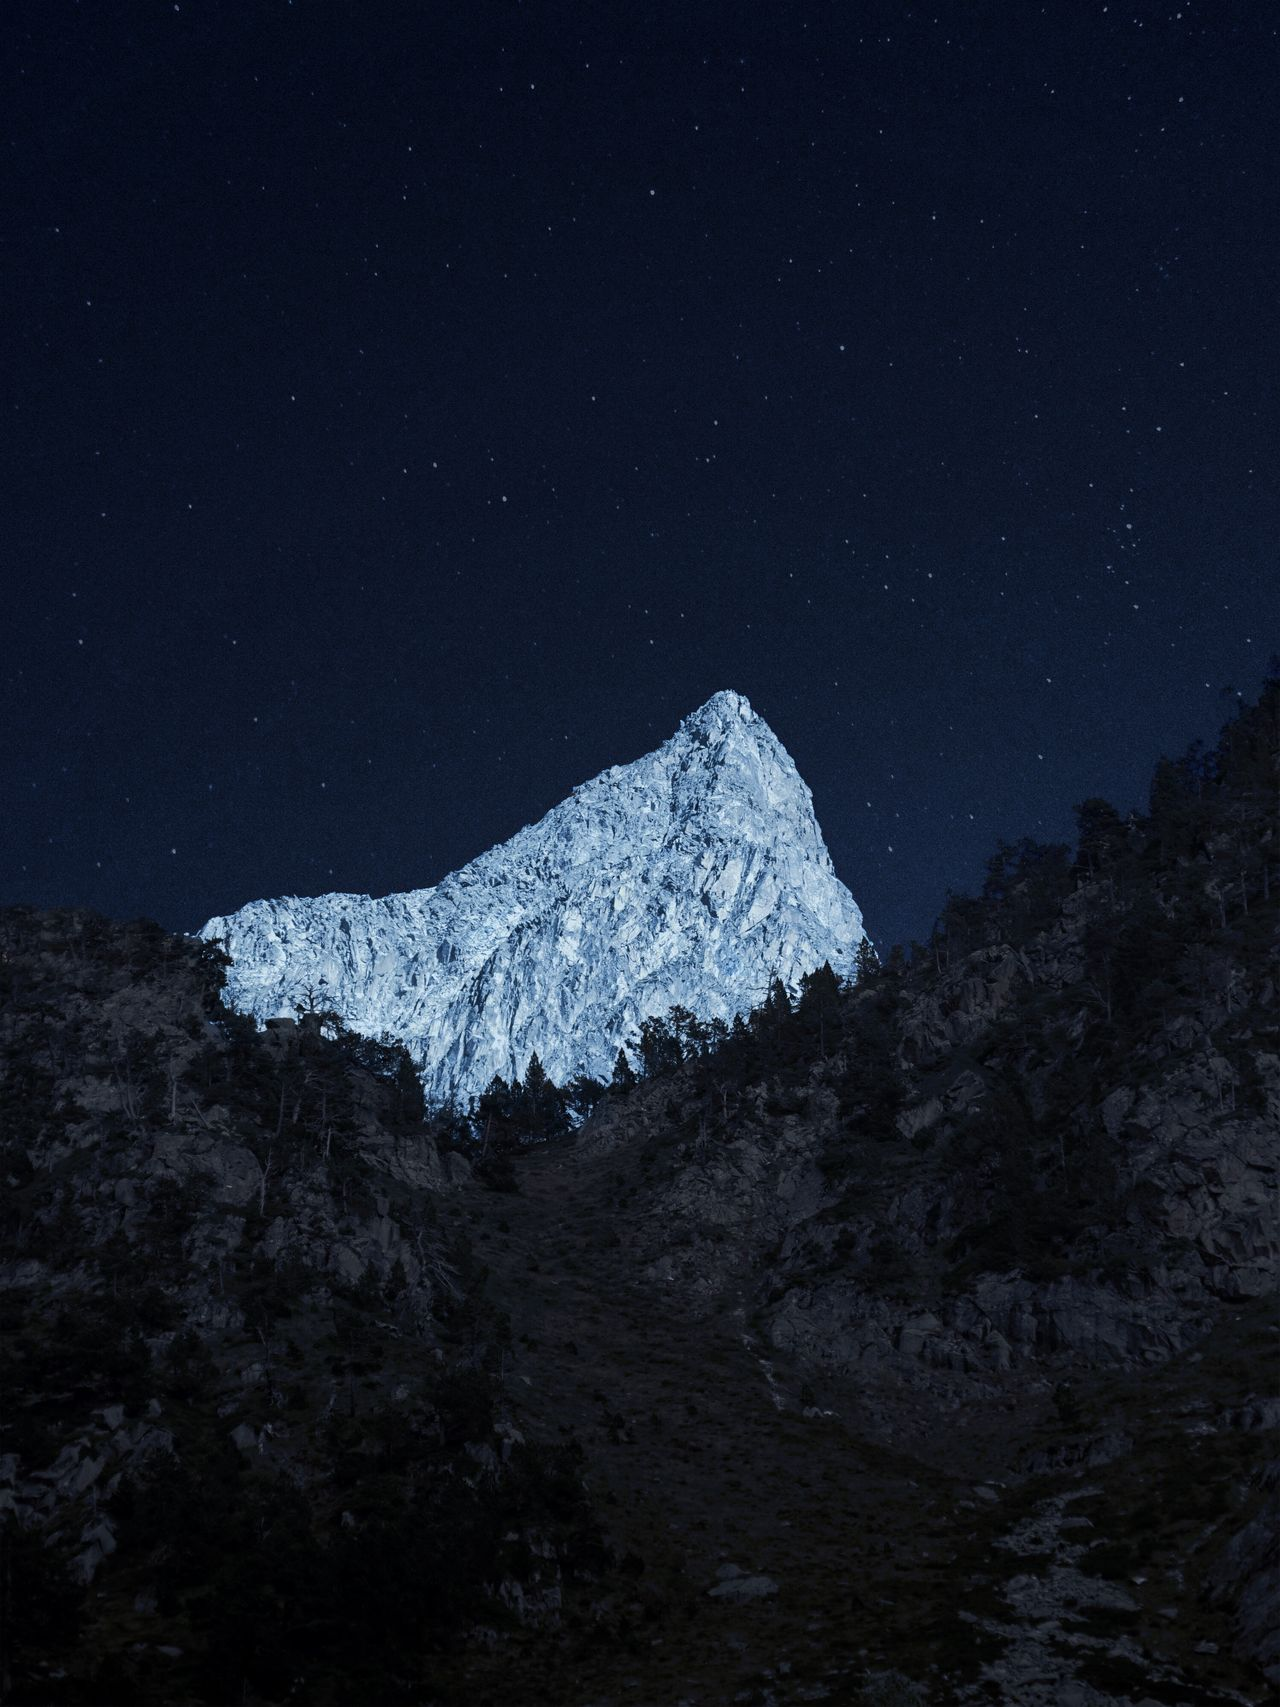 mountain mountains night Nightphotography moonlight beauty in Nature Nature cold temperature outdoors landscape astronomy EyeEmBestPics Empty Places EyeEm Best Edits TheWeekOnEyeEM Night Photography EyeEm Best Shots